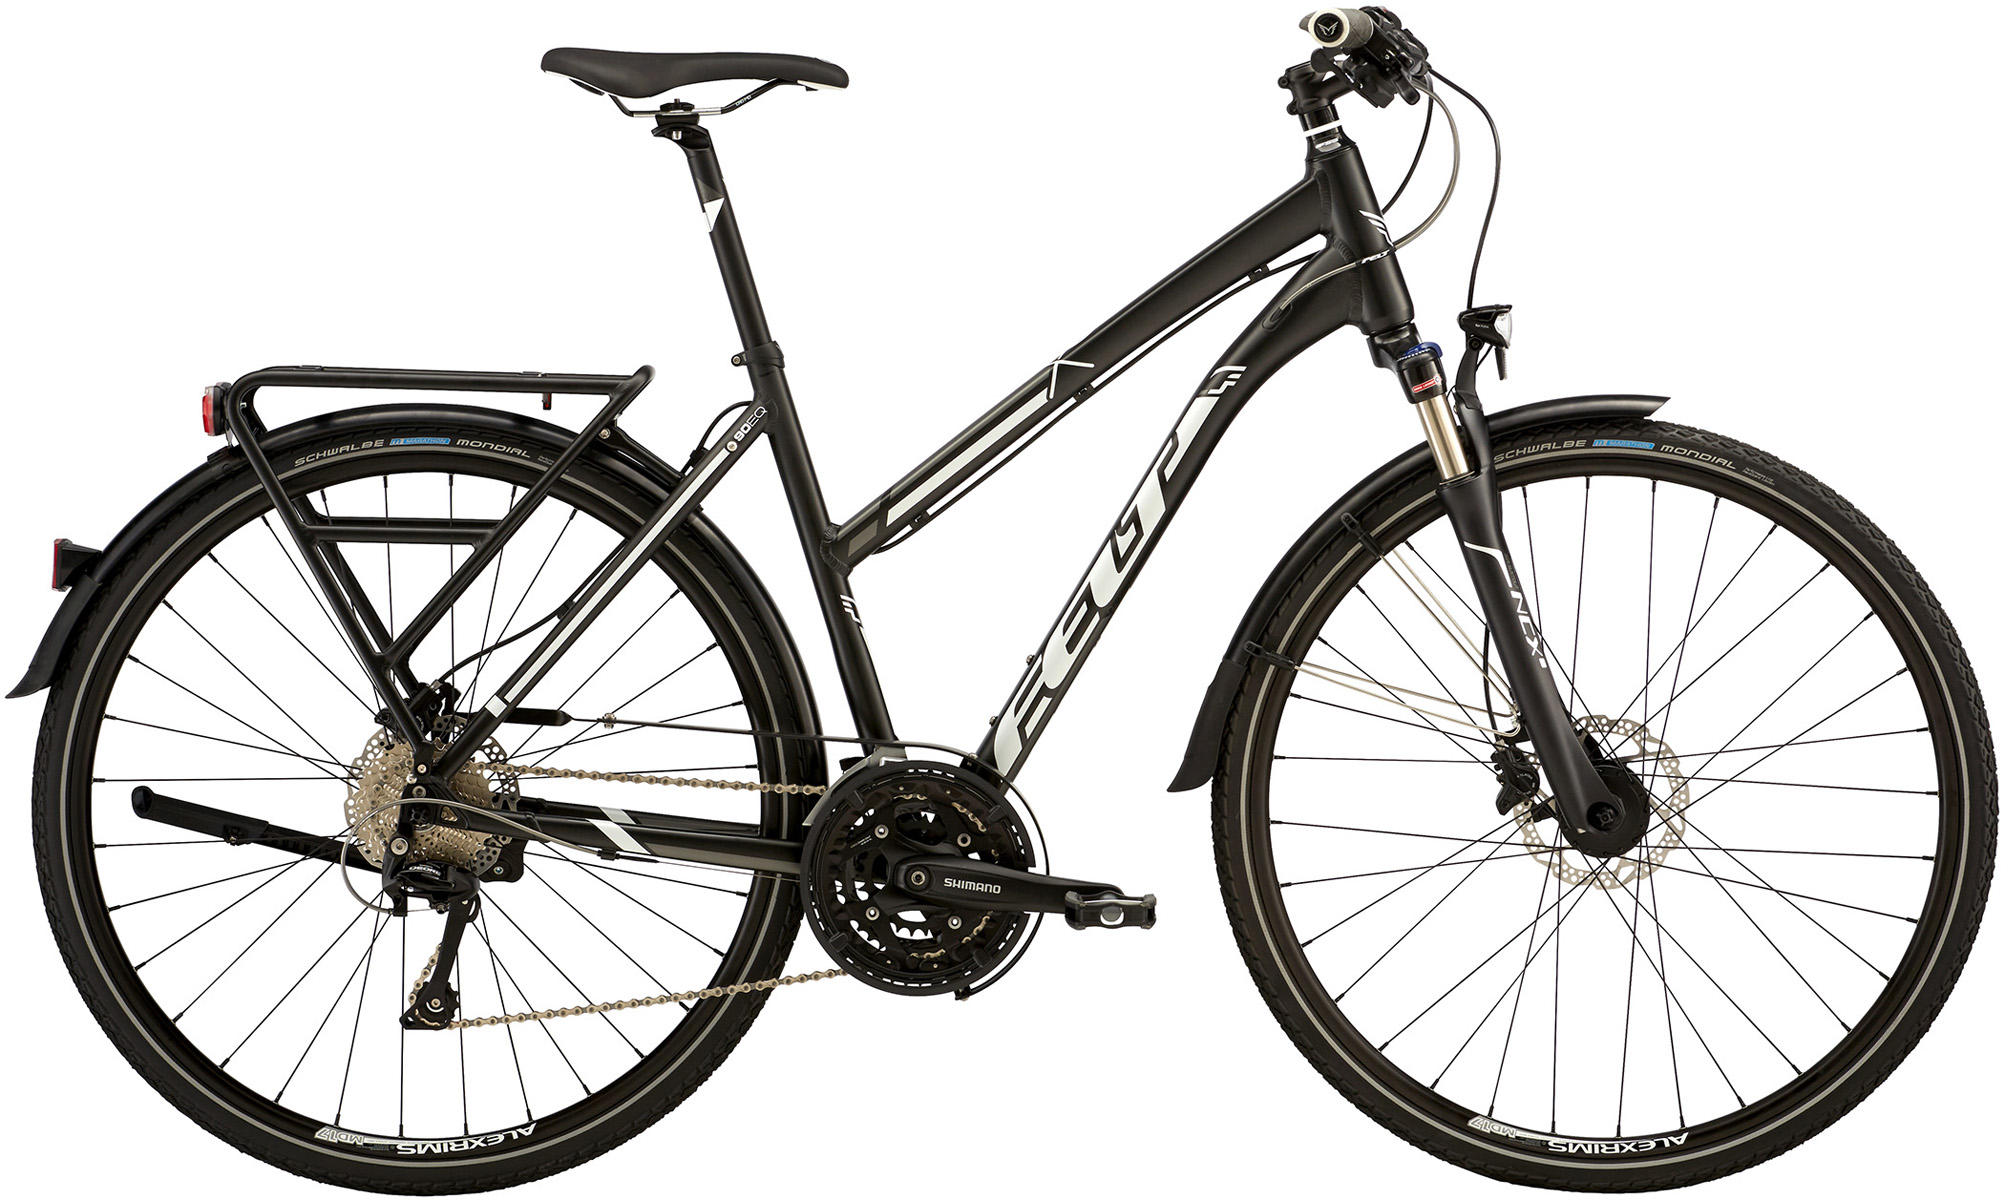 "Dámské trekové kolo FELT QX90EQ 2016 + cyklovýbava za 800 Kč zdarma černá, 17"", 44 cm"